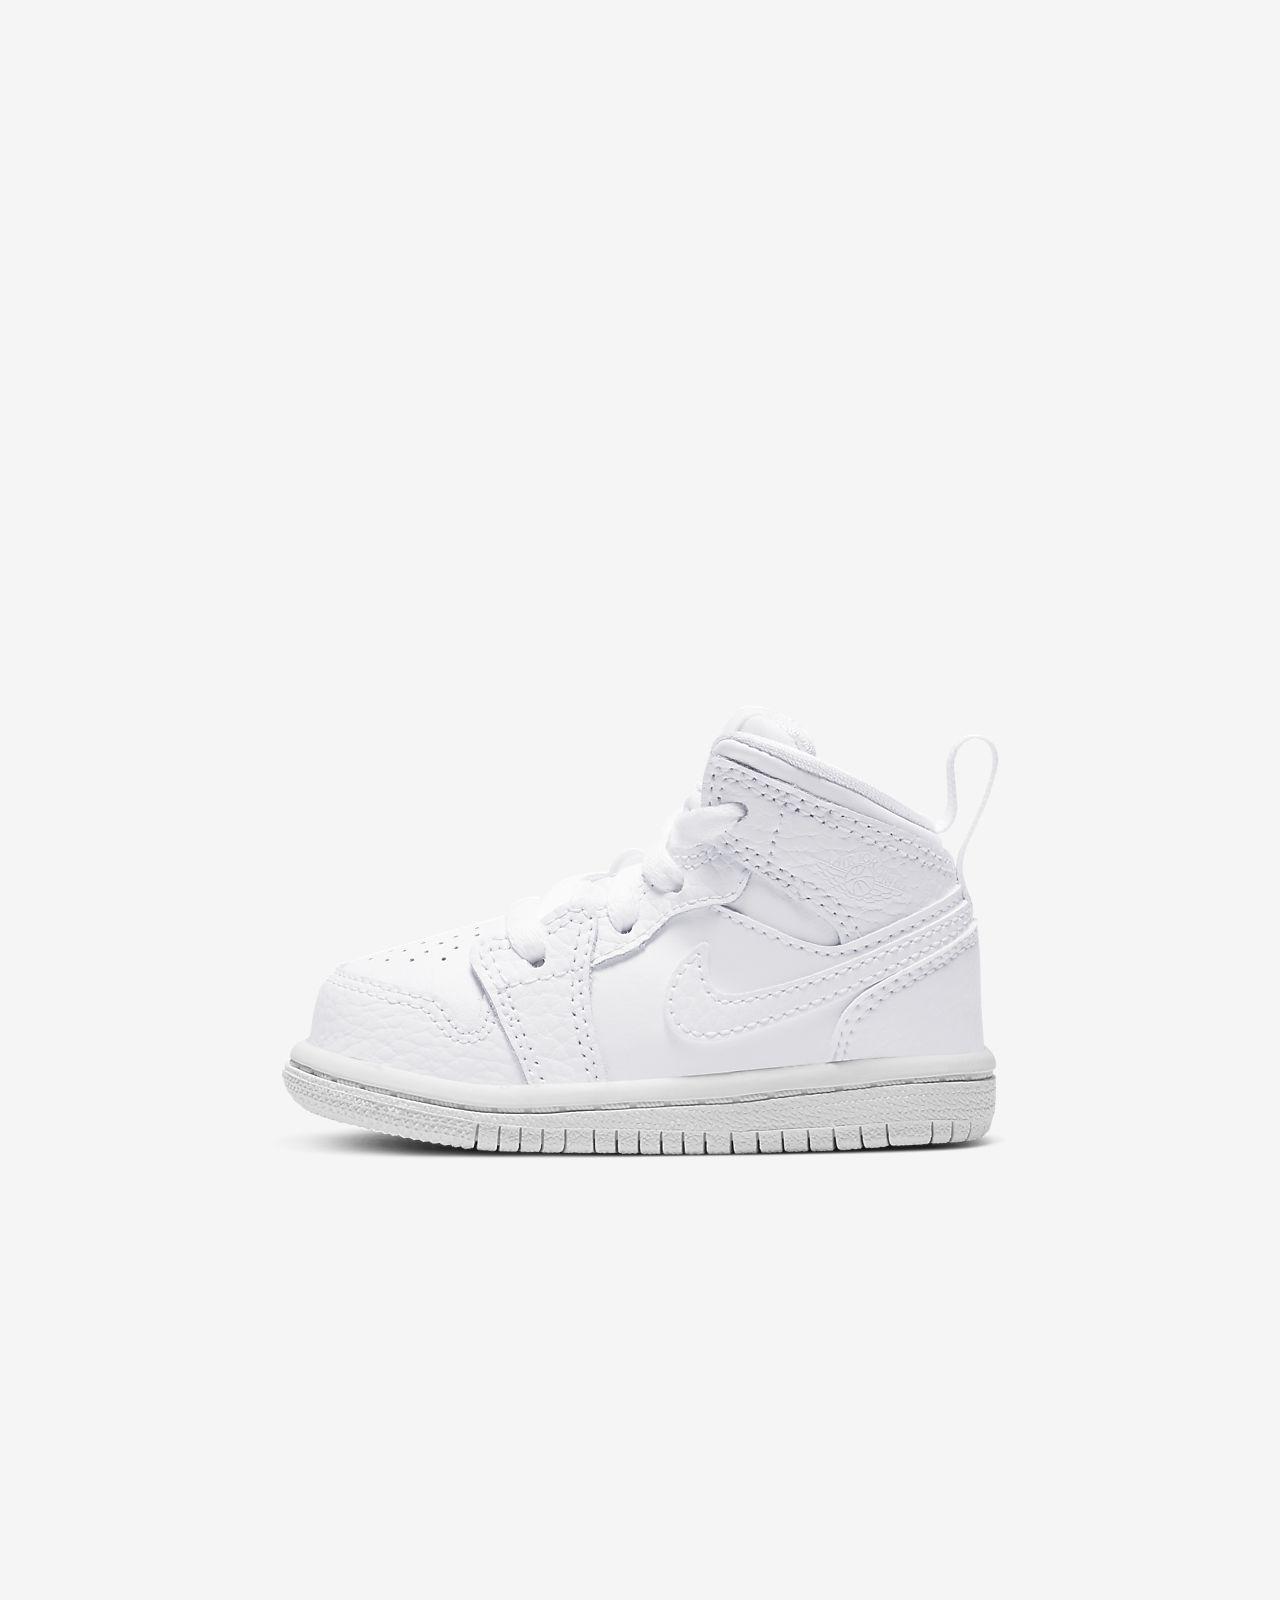 Calzado para bebé e infantil Air Jordan 1 Mid